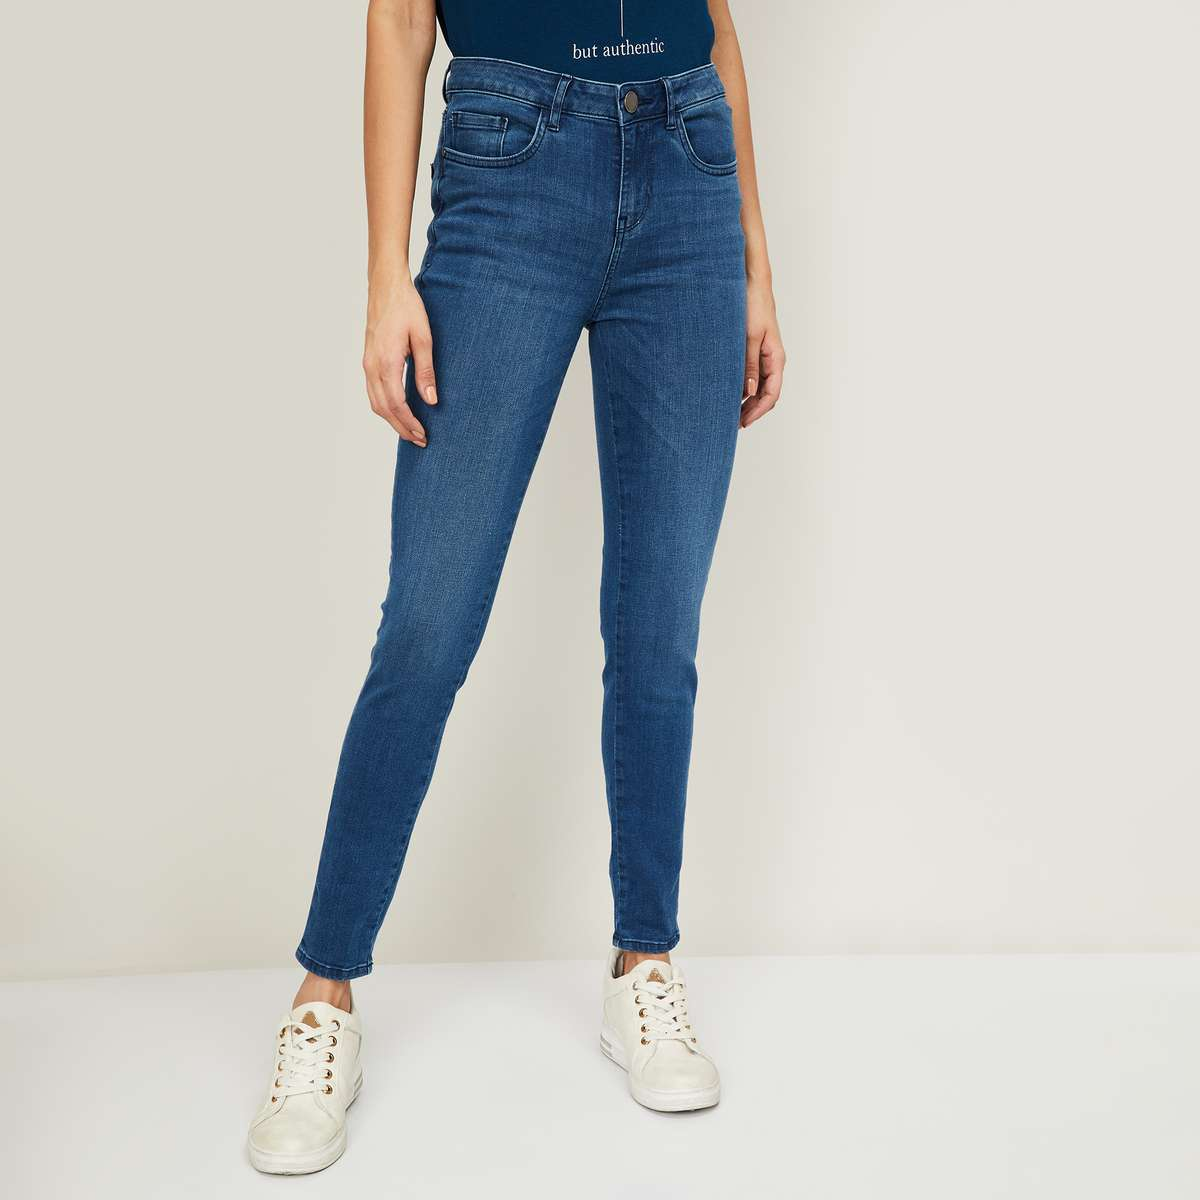 6.VAN HEUSEN Women Stonewashed Skinny Fit Jeans